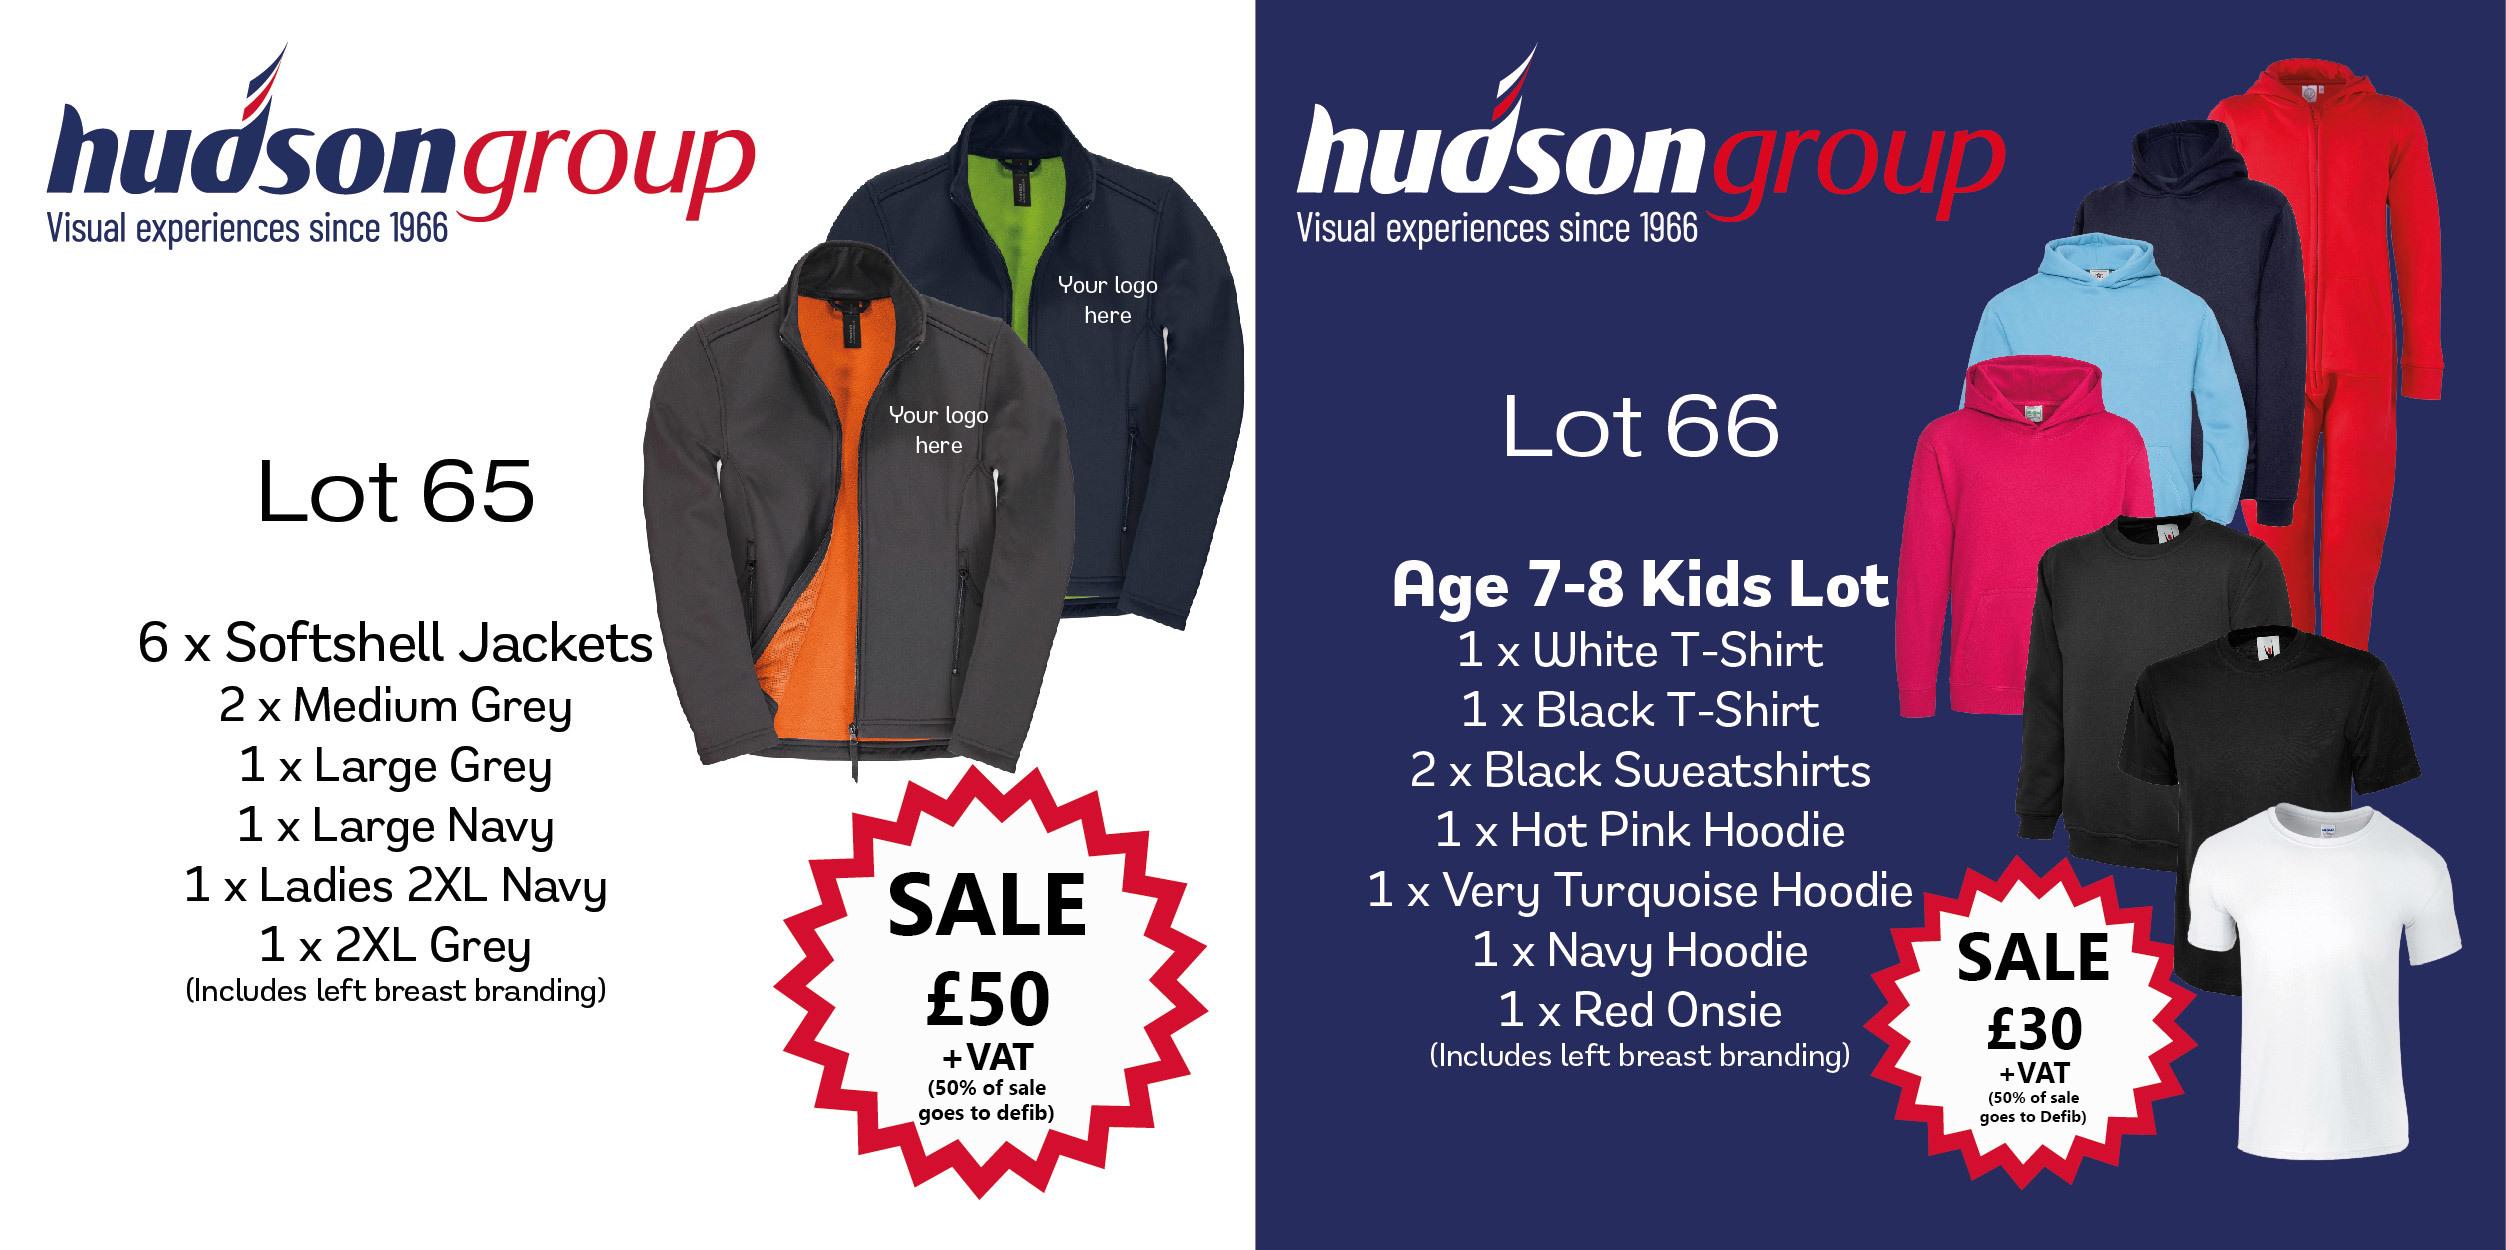 Branded workwear bundles from £50.00!